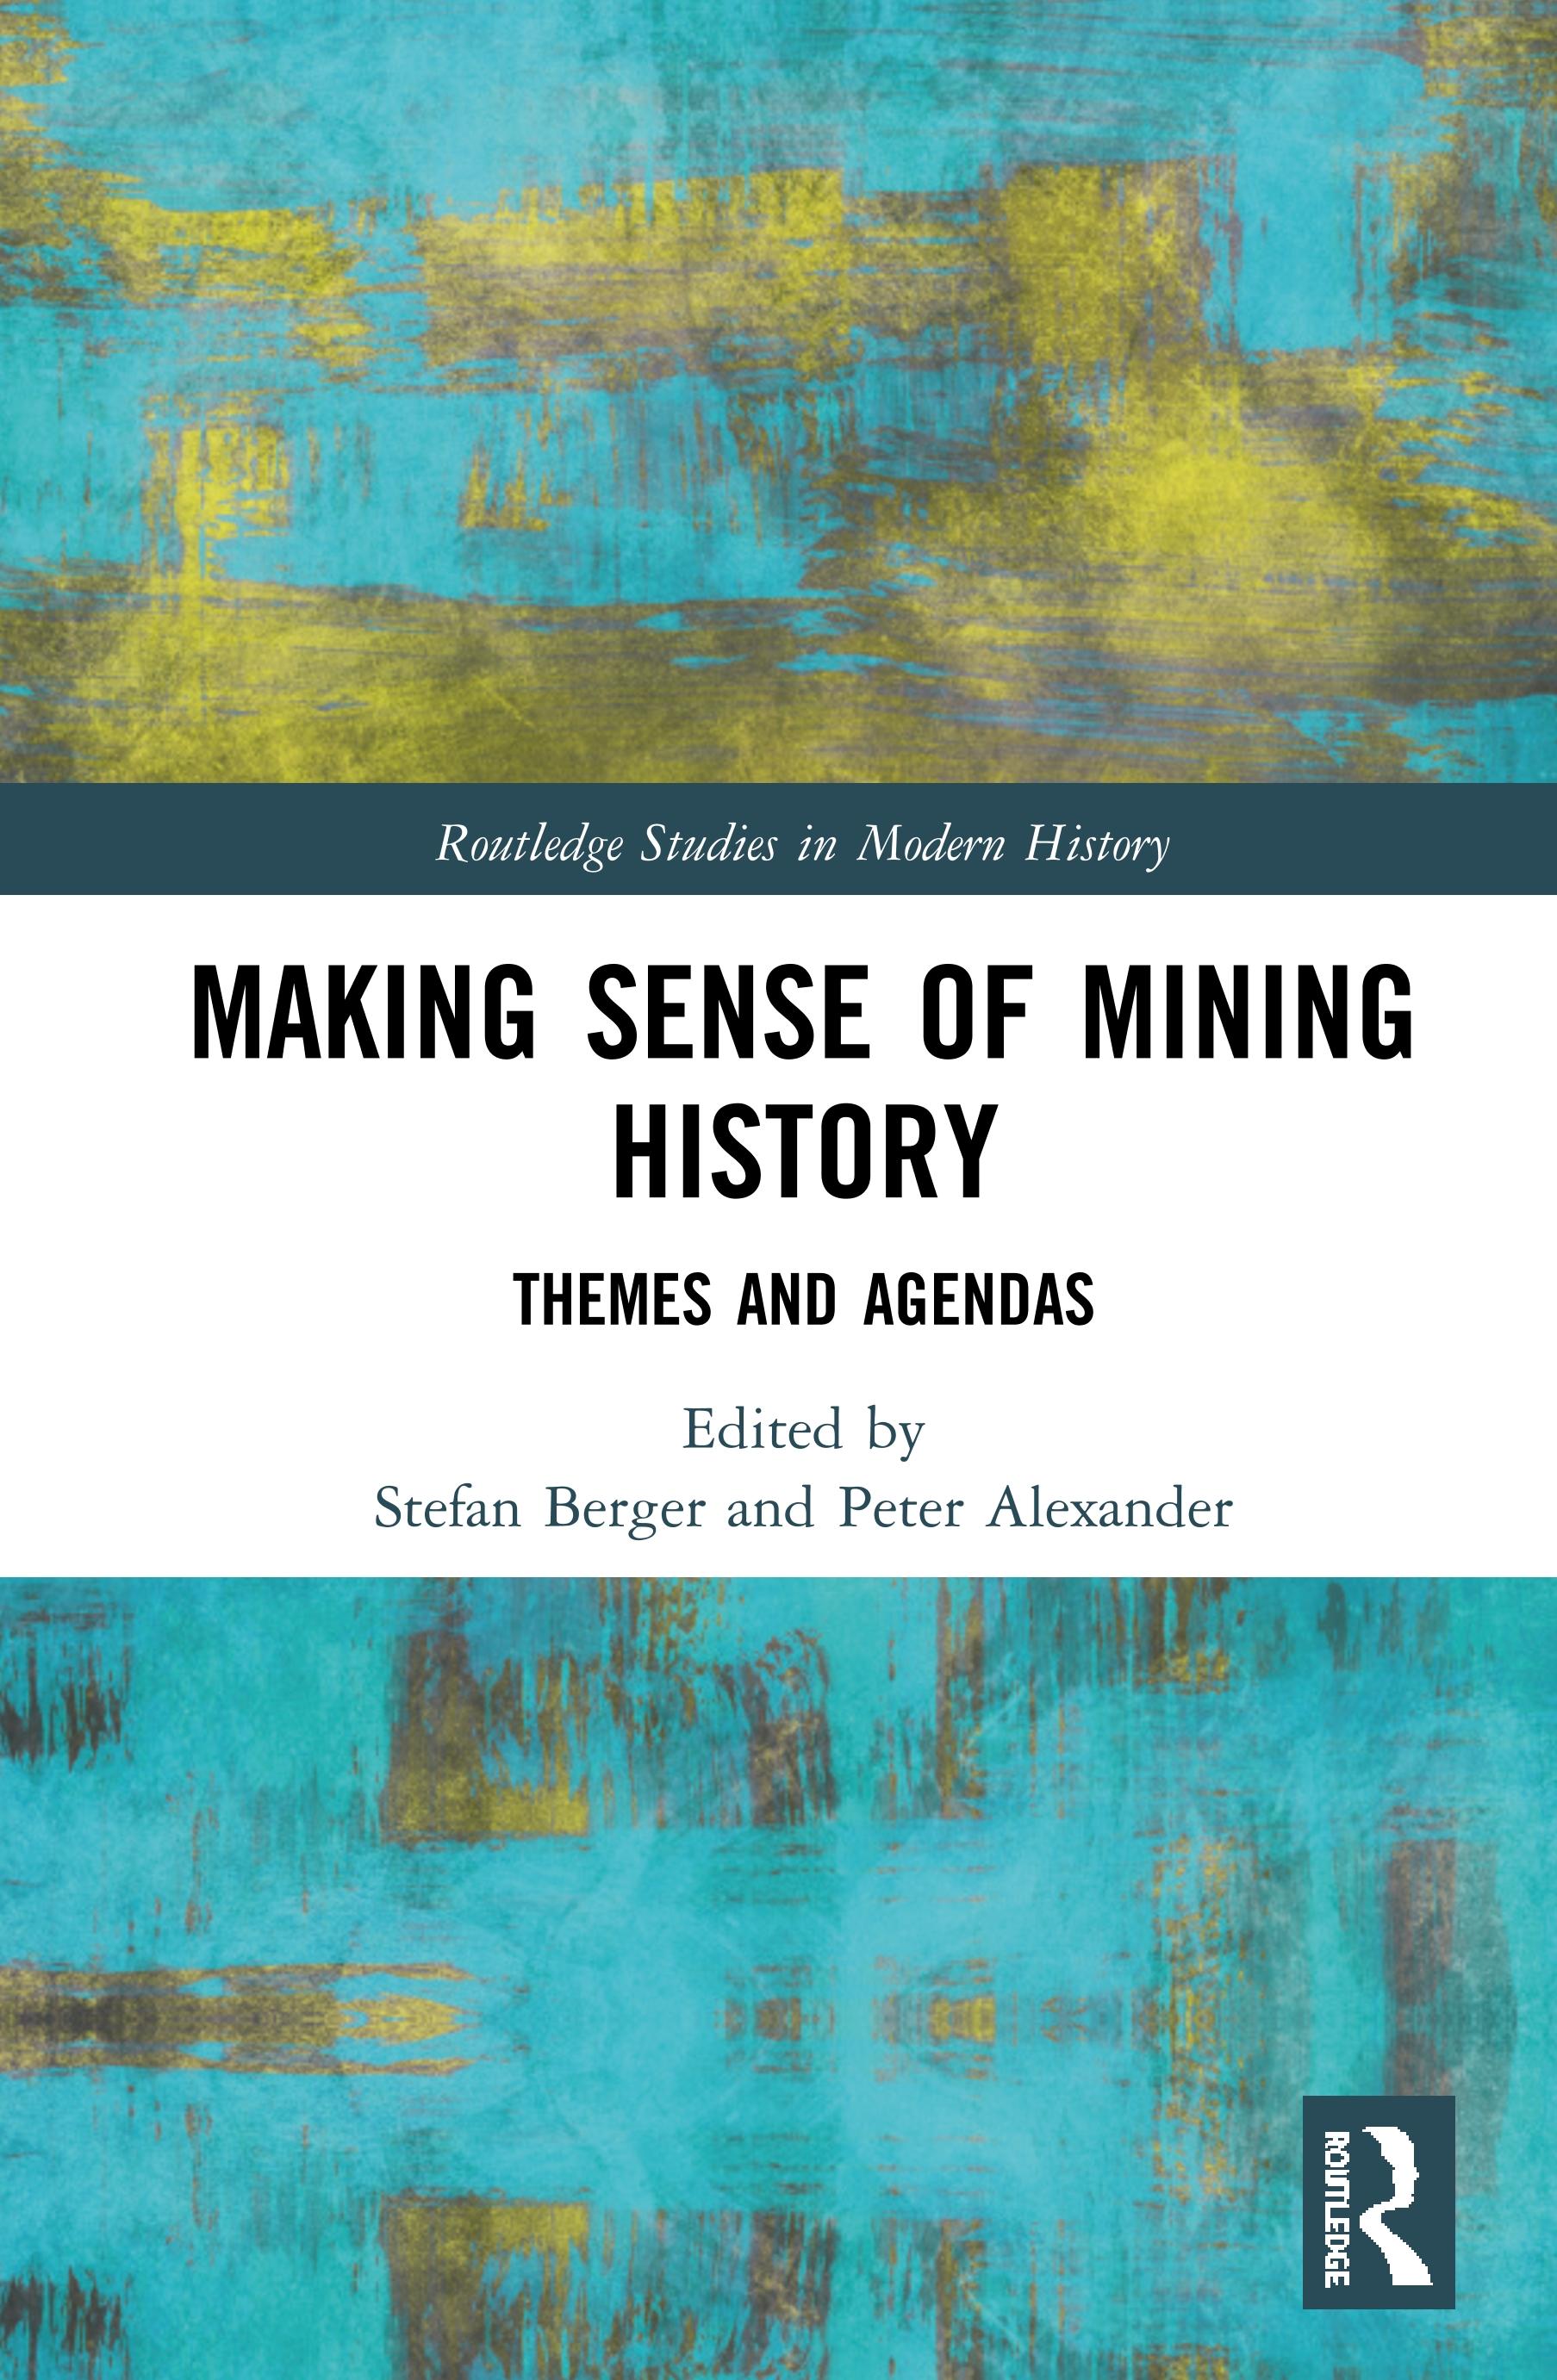 Making Sense of Mining History